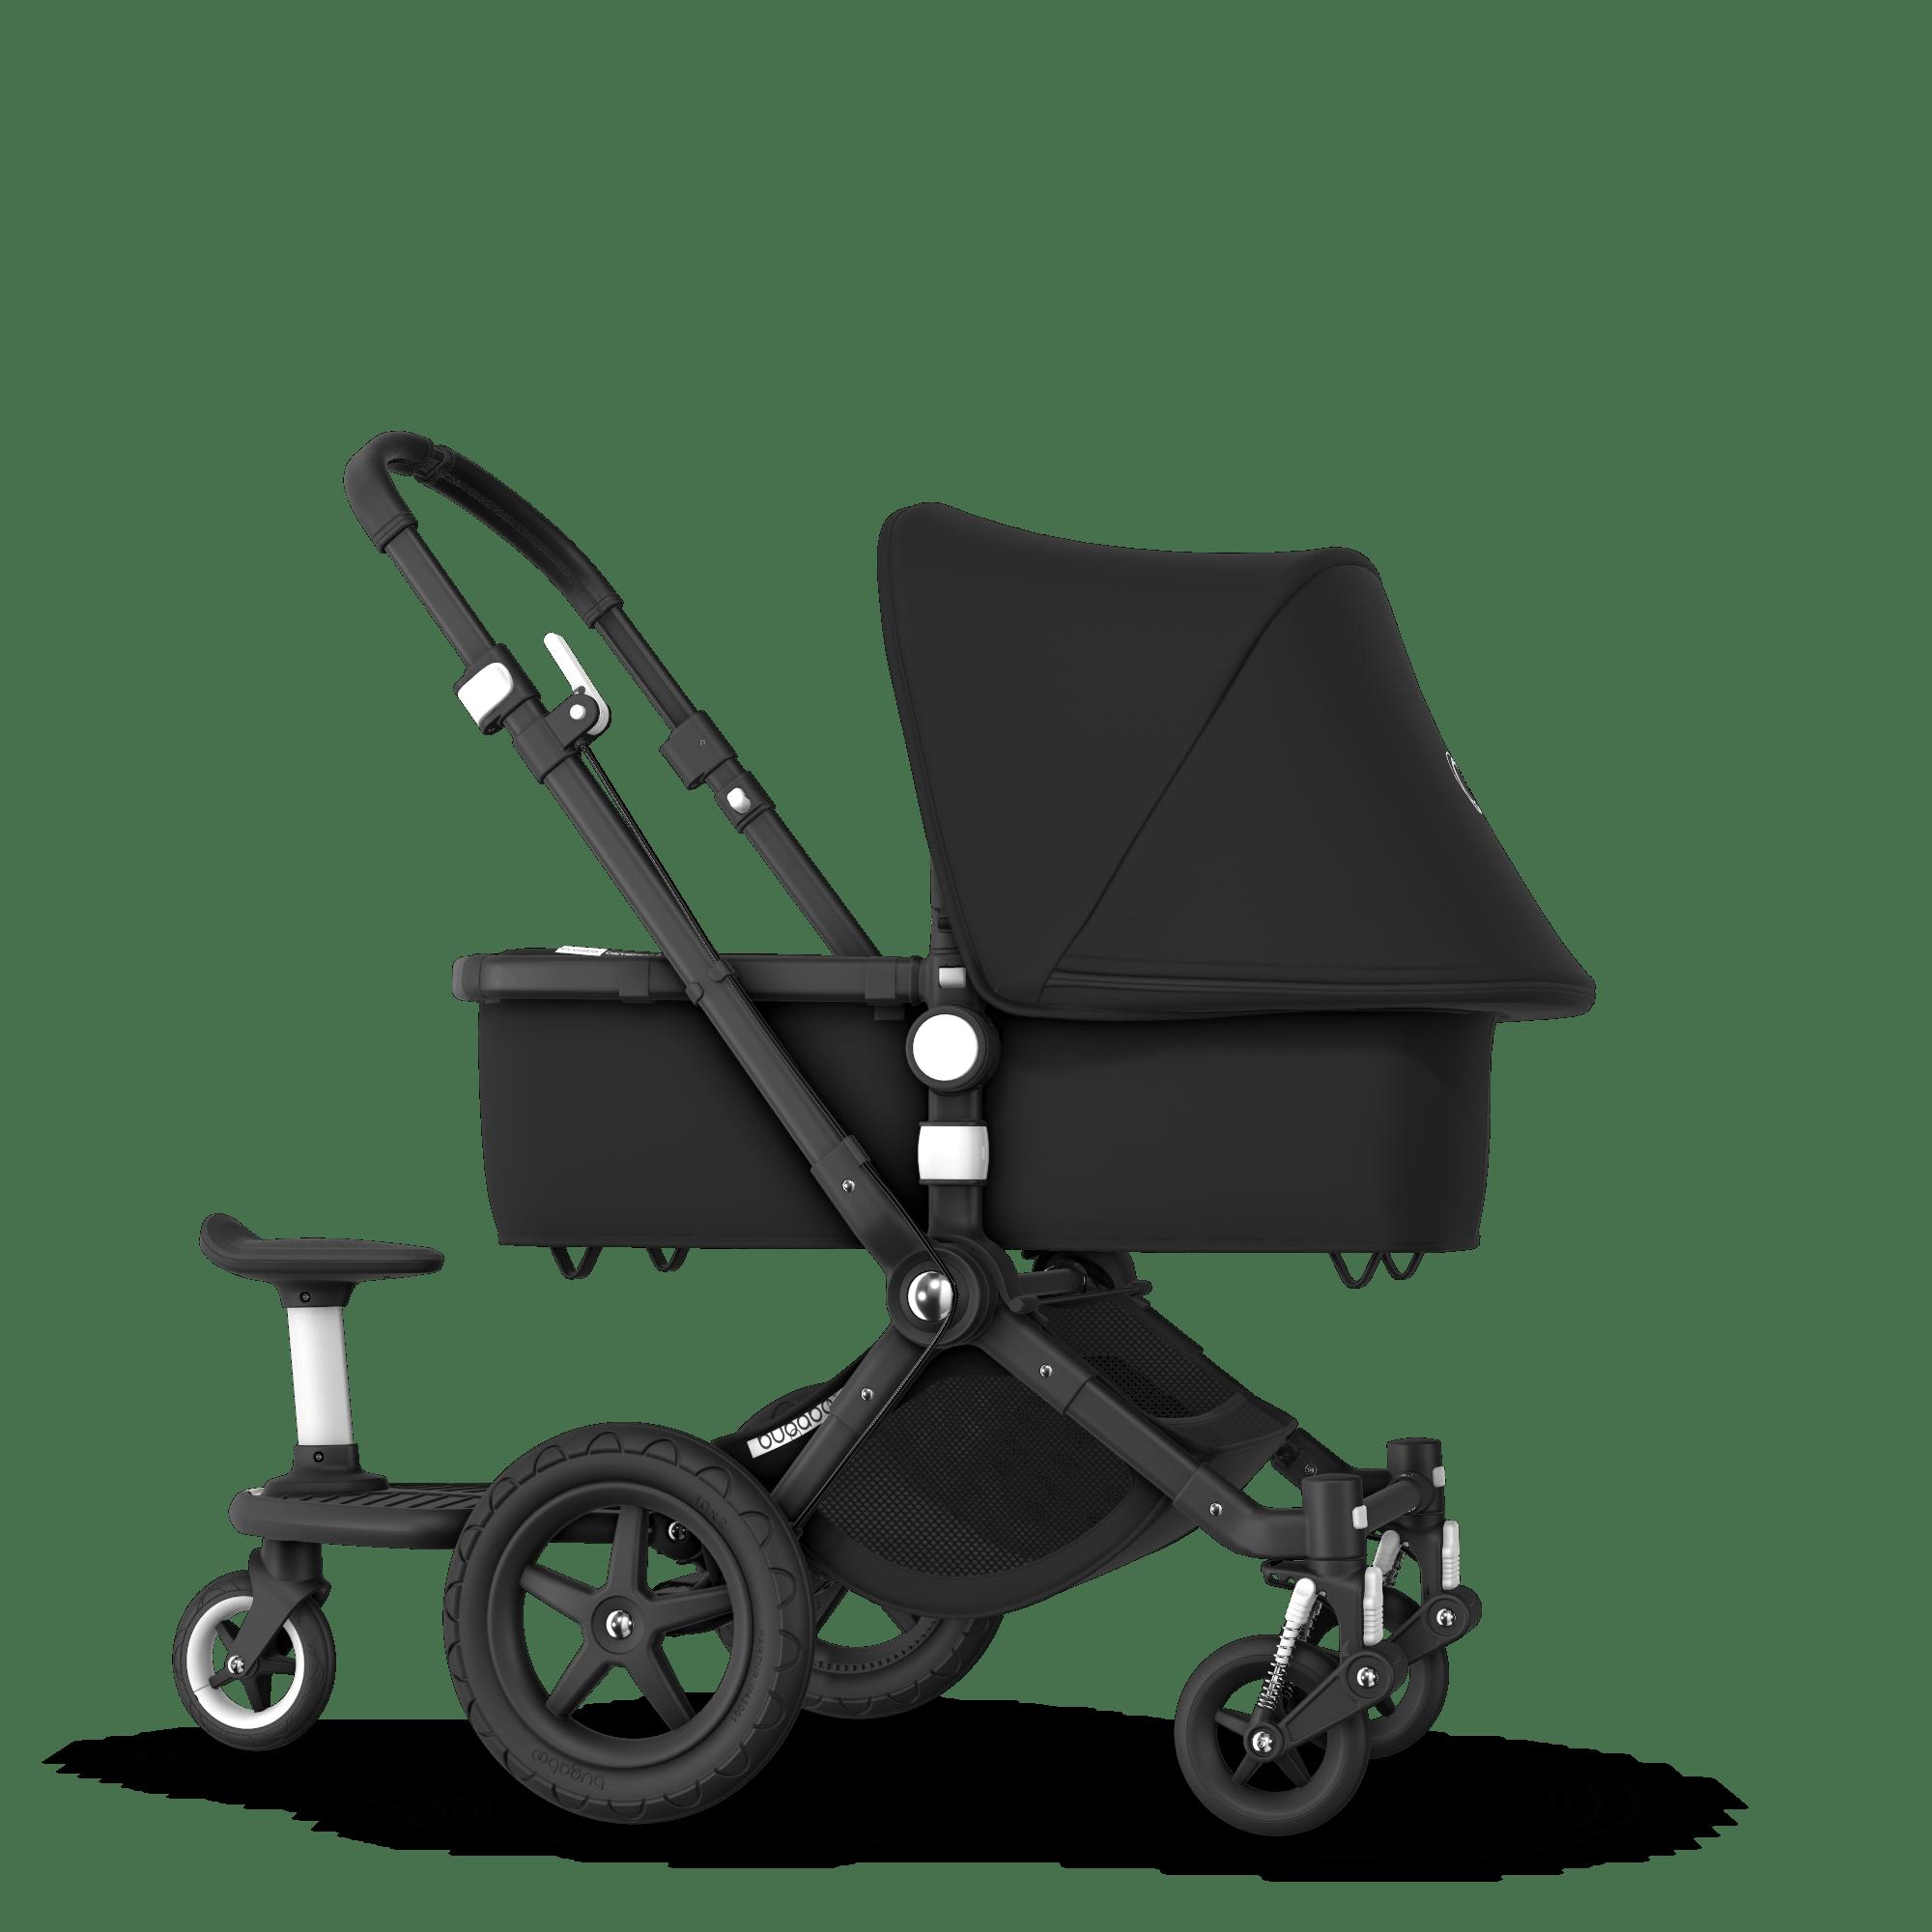 bugaboo cameleon 3 plus sit and stand stroller black sun canopy black fabrics black base